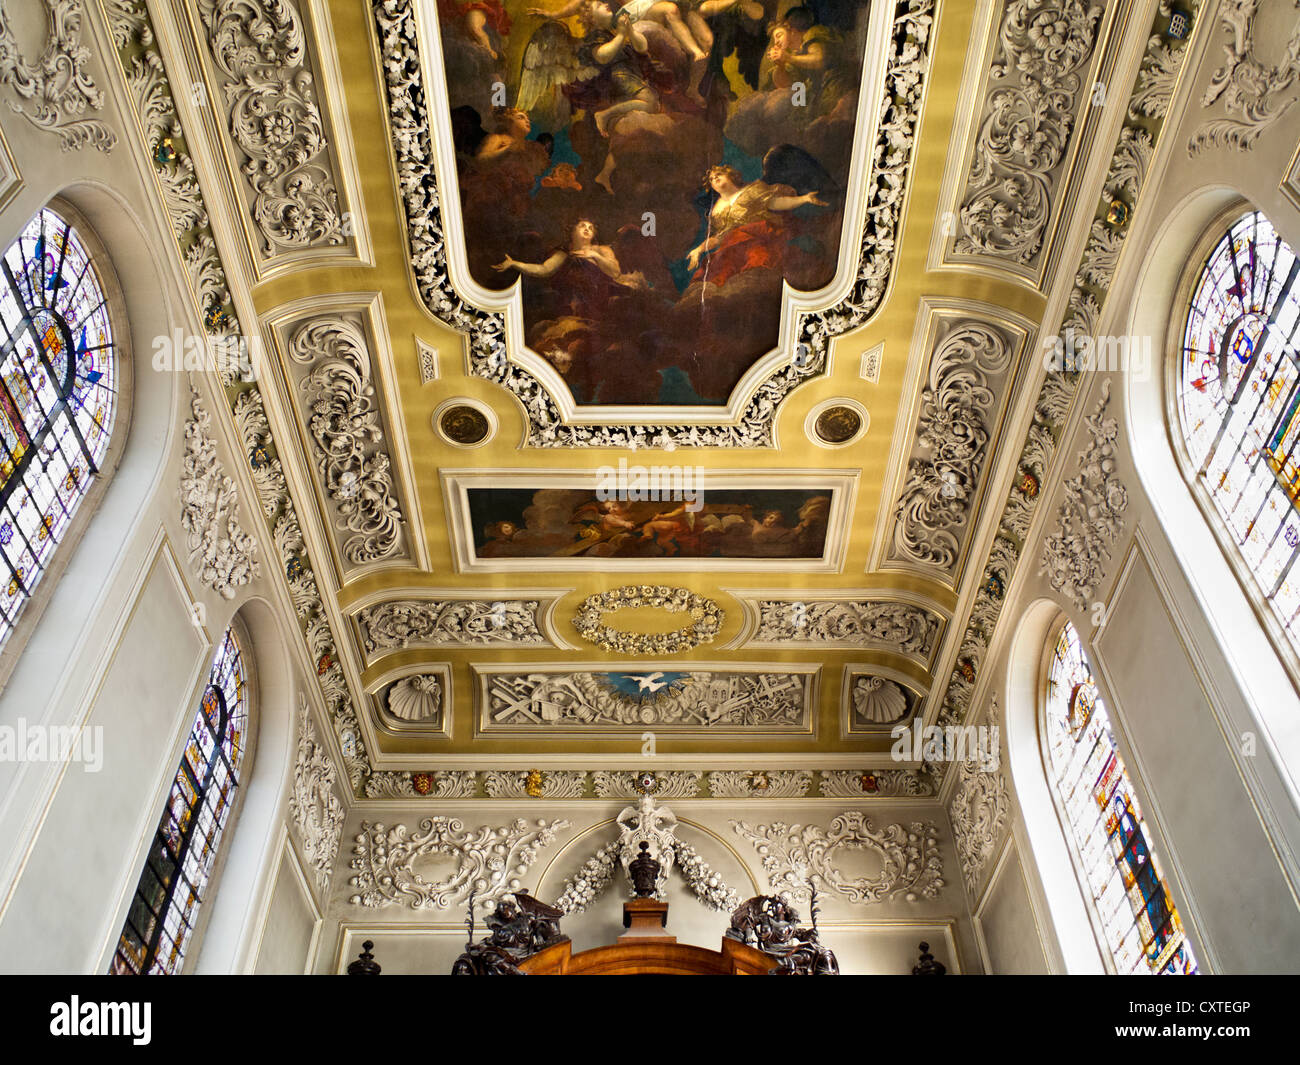 Interior of Trinity College Chapel, Oxford 4 - Stock Image